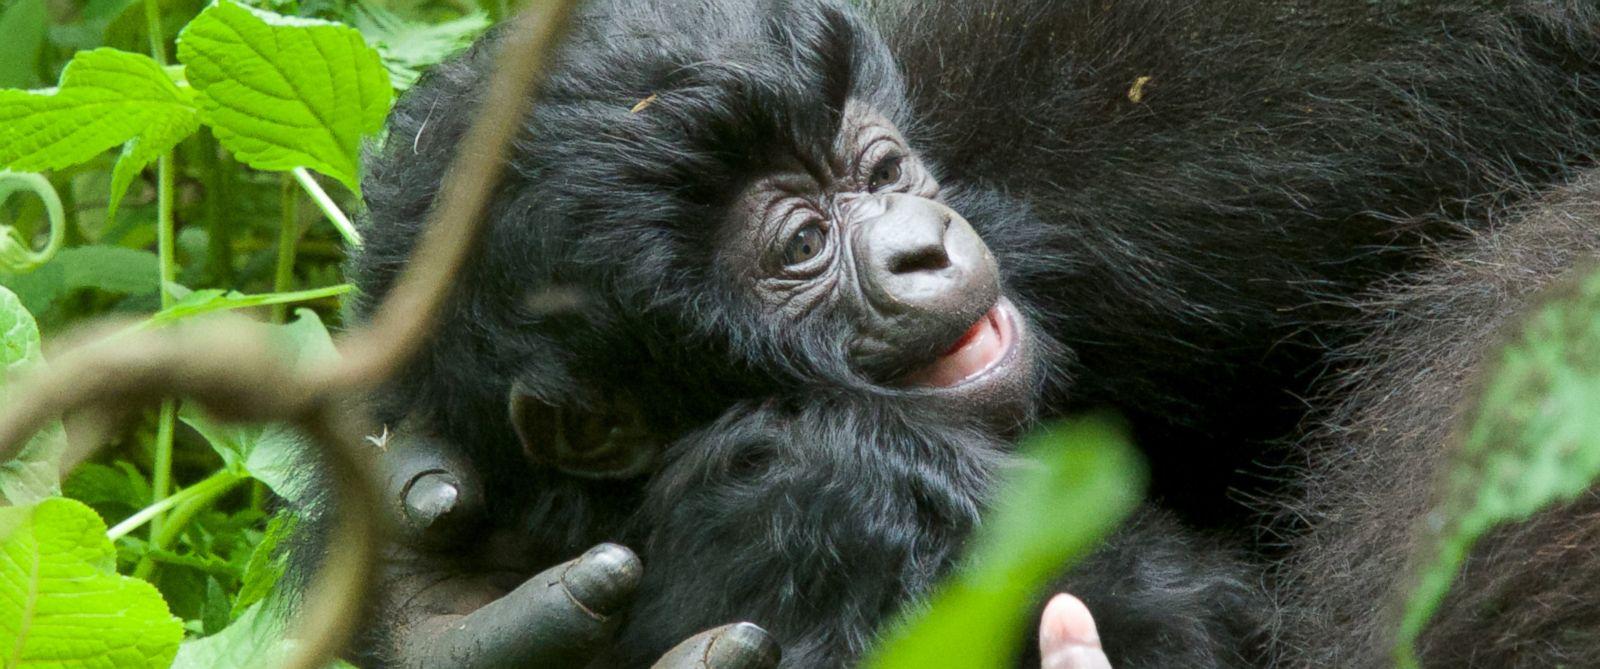 baby gorilla in volcanoes national park